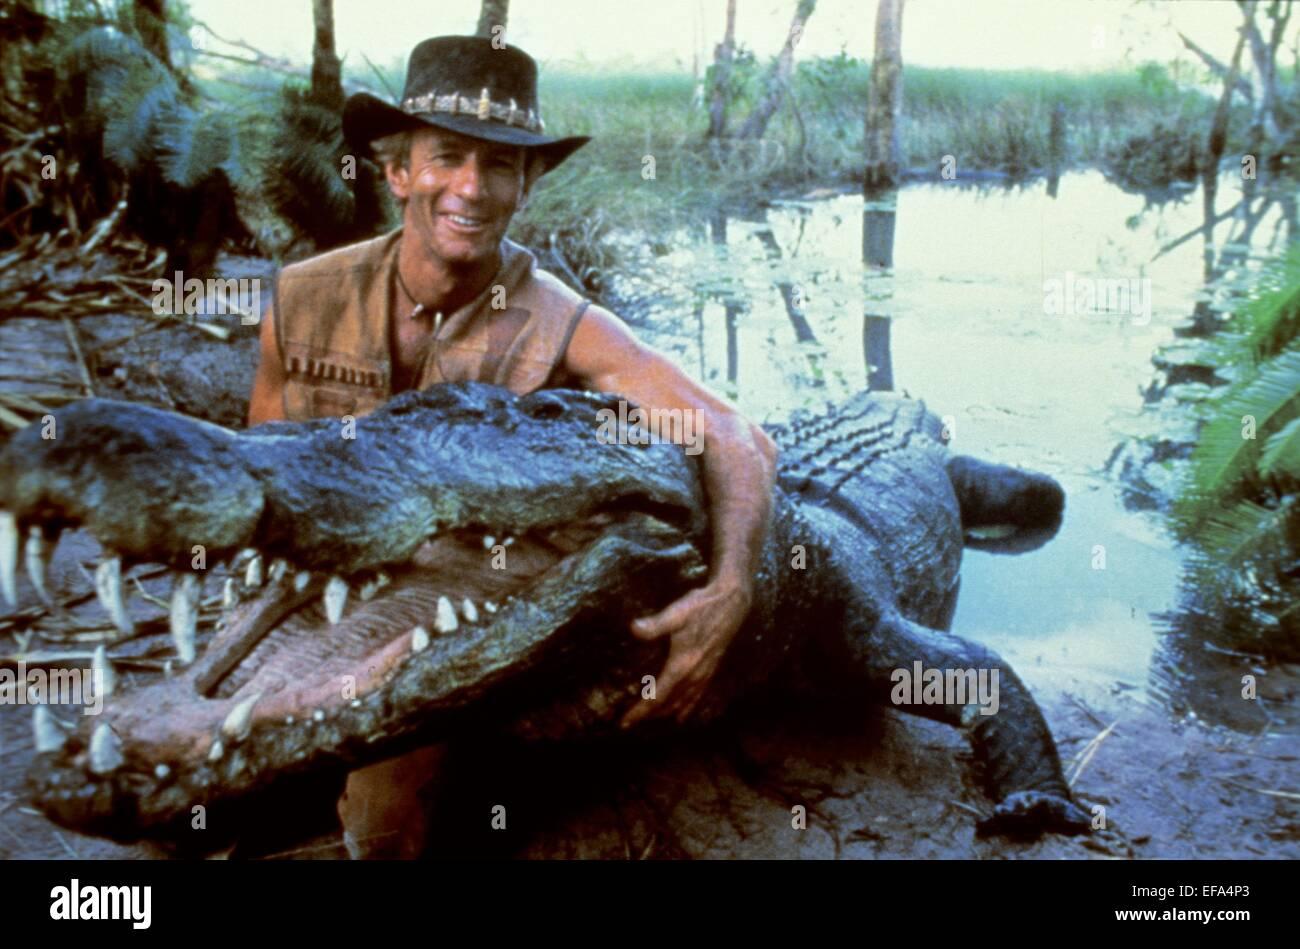 095756e0af8 Crocodile Dundee Stock Photos   Crocodile Dundee Stock Images - Alamy